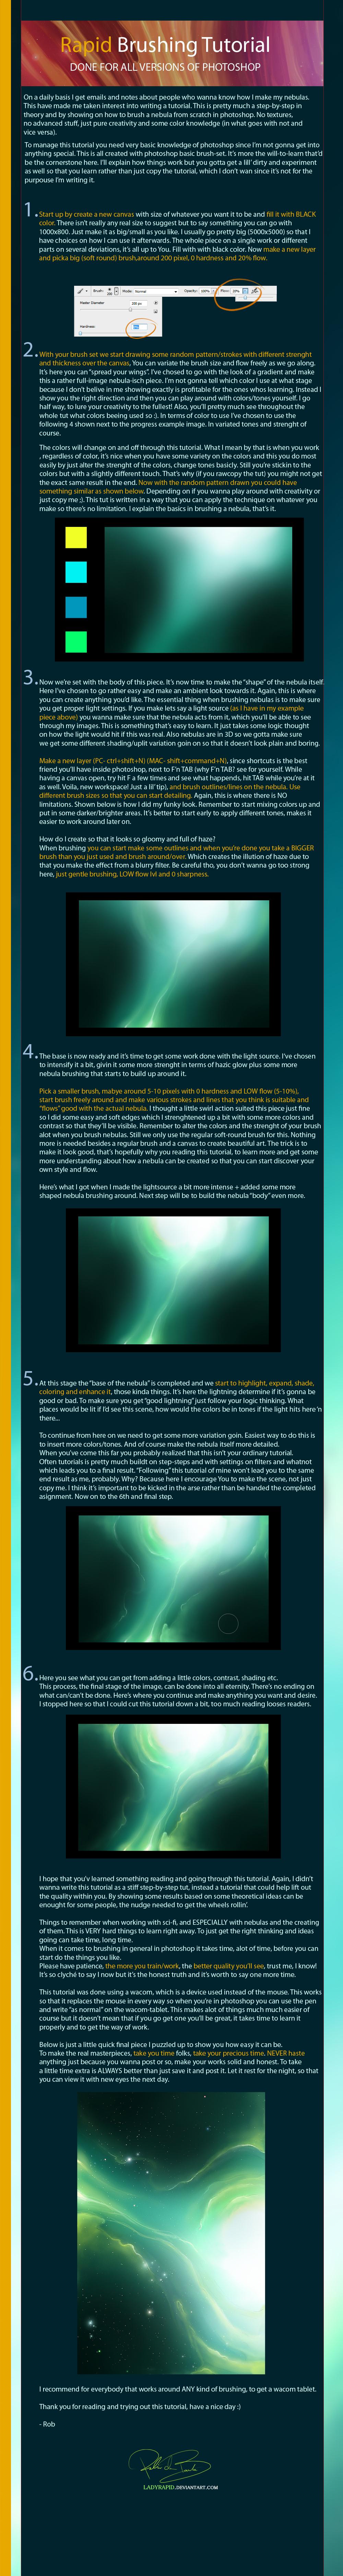 Nebula Brushing Tutorial by ladyrapid